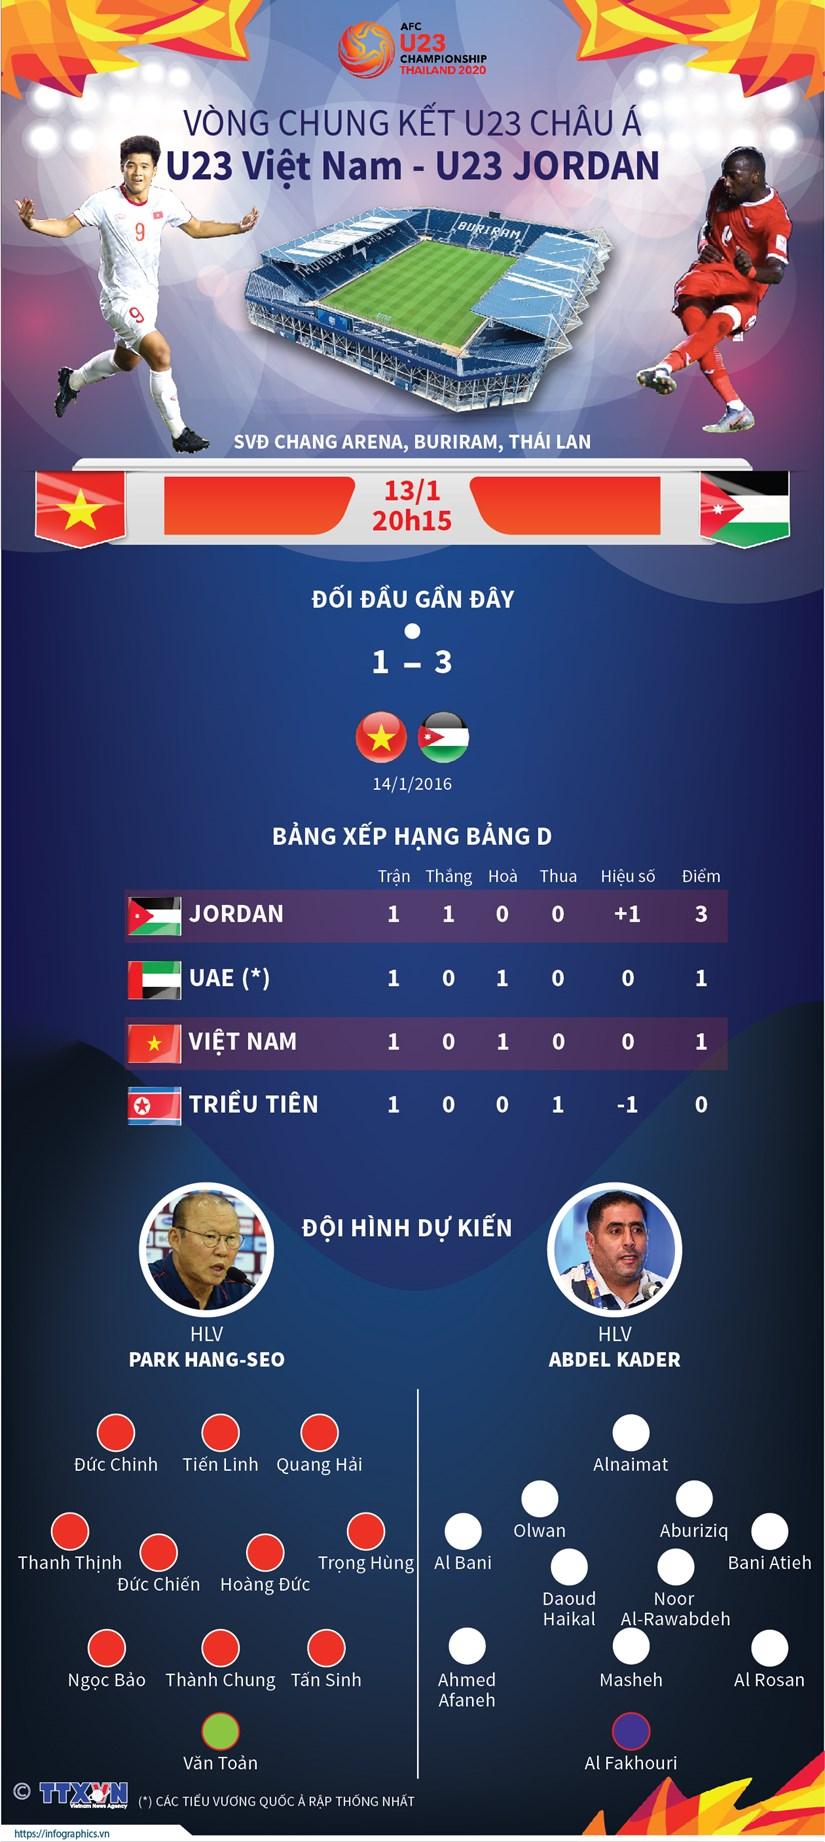 [Infographics] U23 Viet Nam quyet tam gianh diem truoc U23 Jordan hinh anh 1